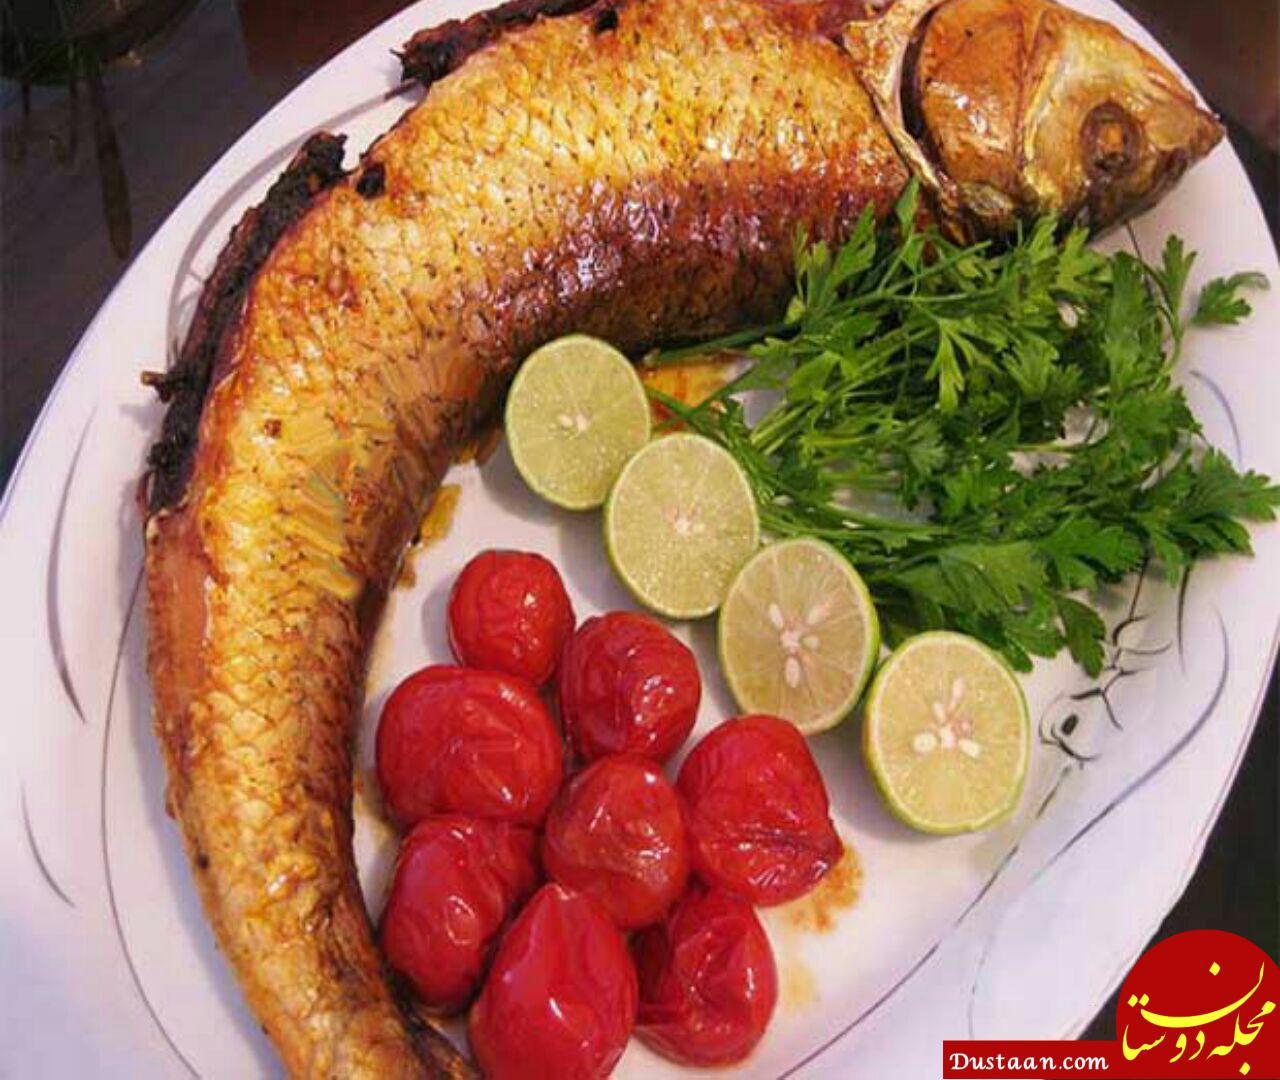 www.dustaan.com طرز تهیه ماهی شکم پر به سبکی خوشمزه